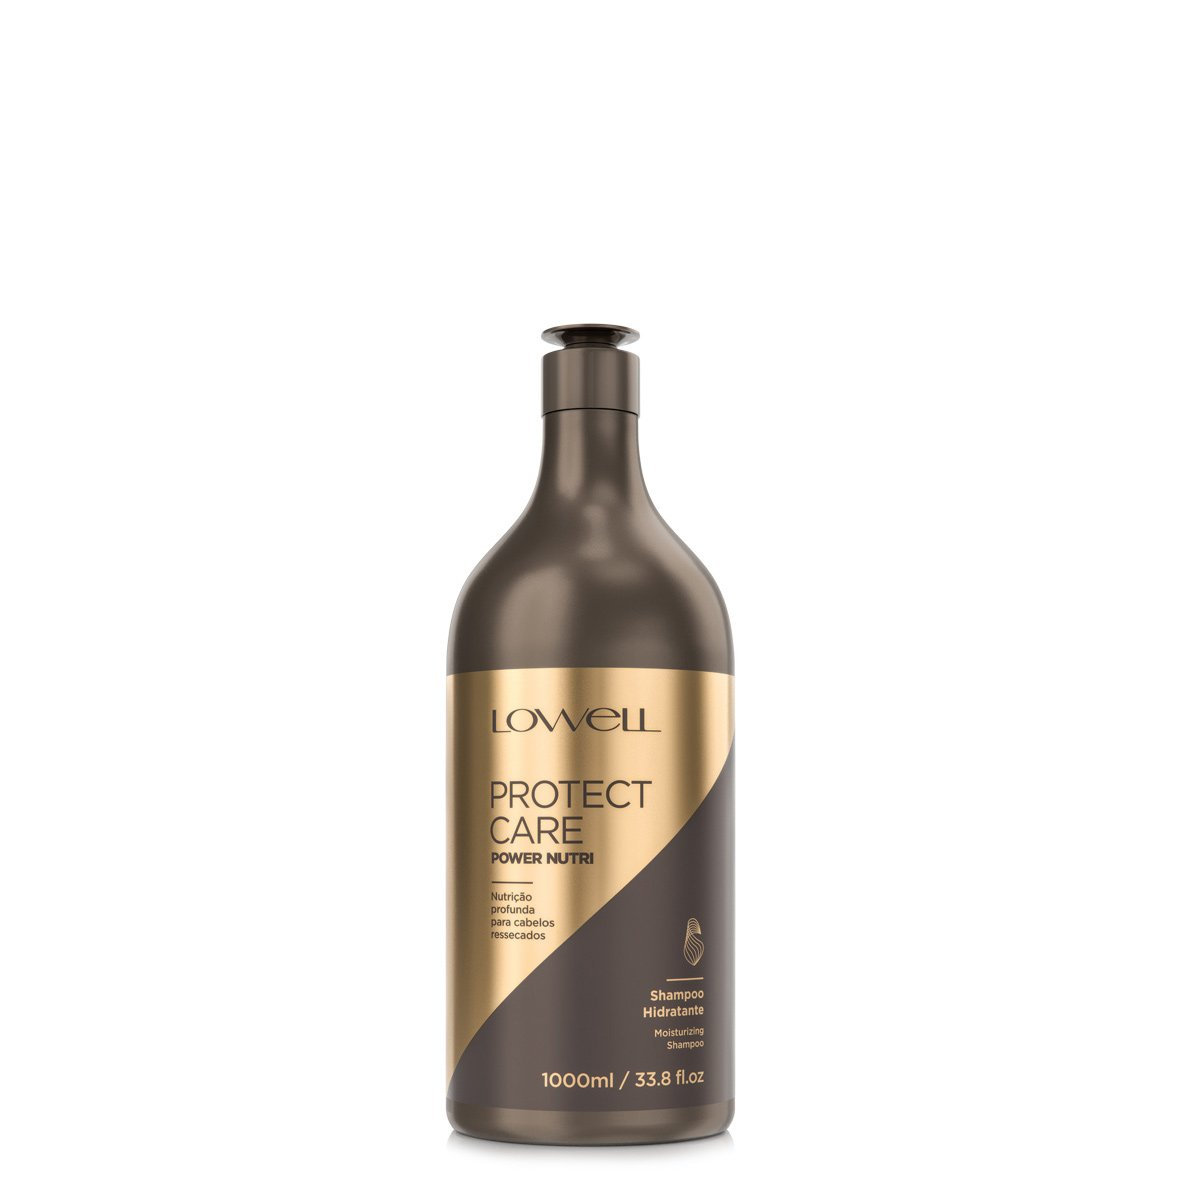 Shampoo Power Nutri Protect Care Lowell 1000ml